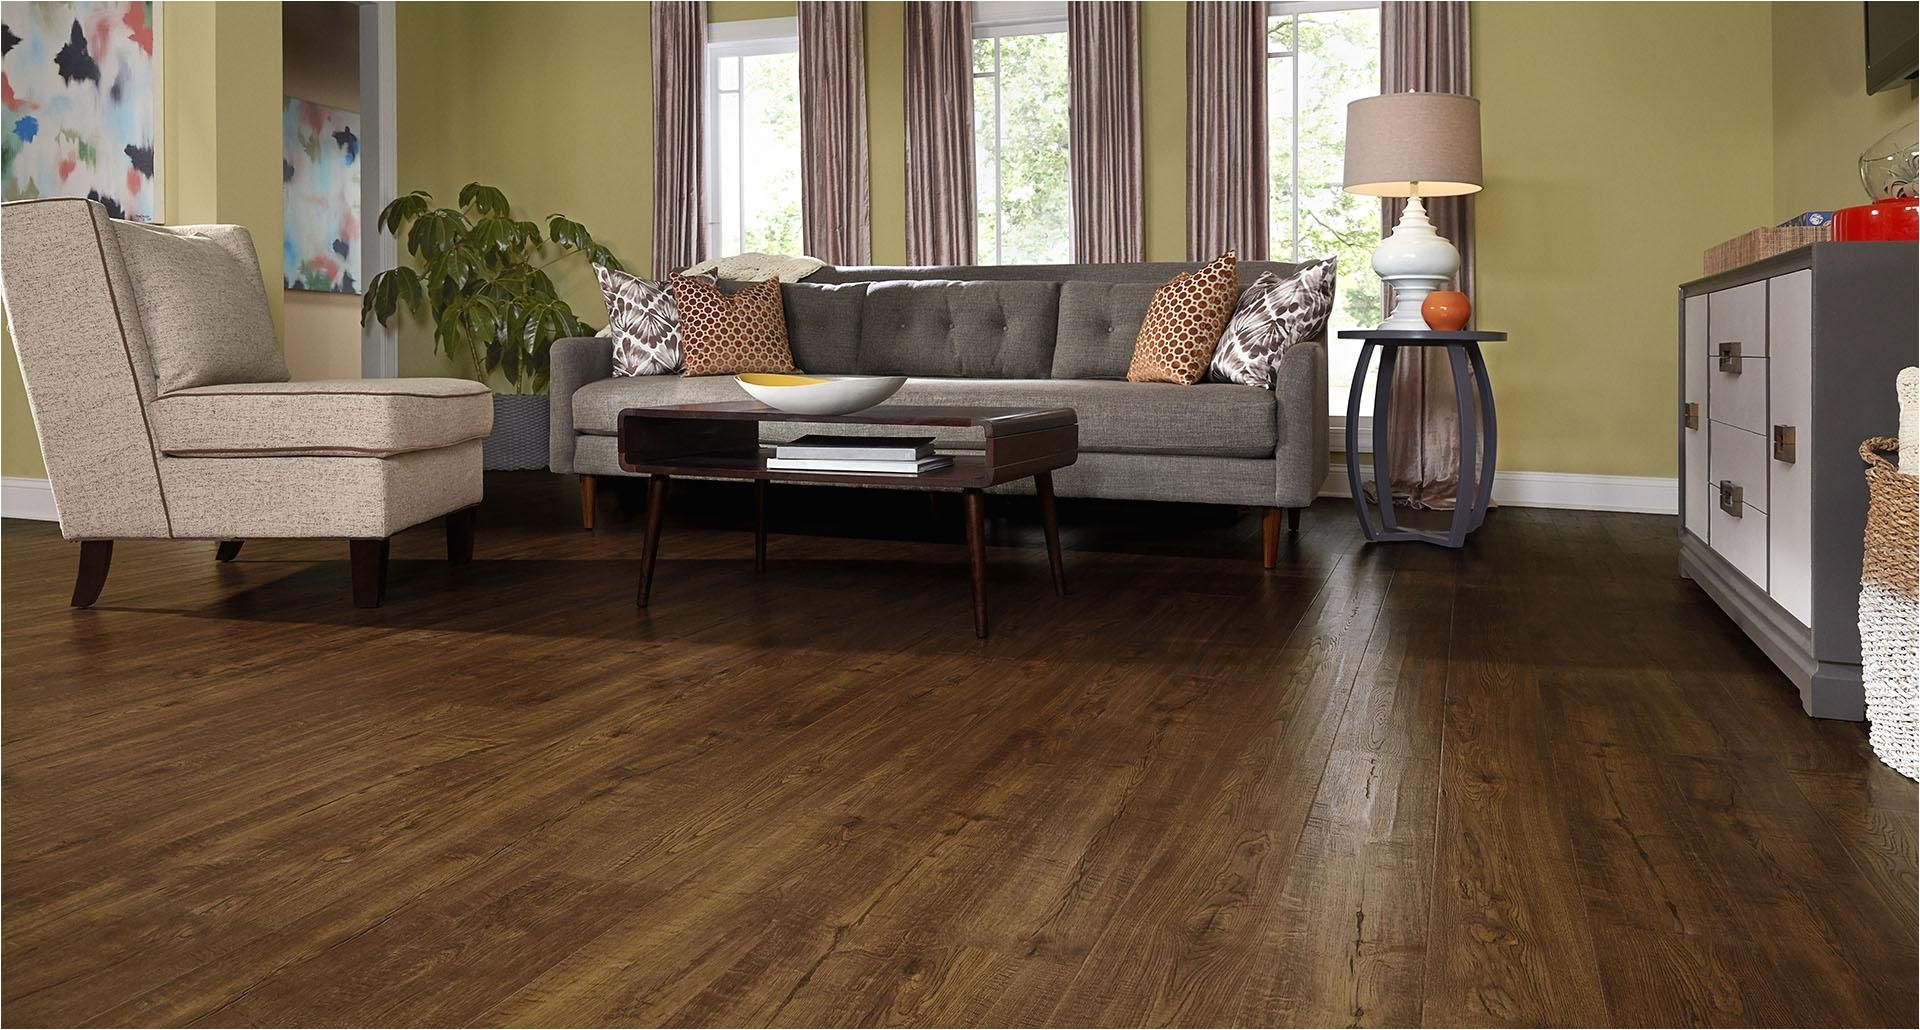 Consumer Reports Best Buy Laminate Flooring Mohawk Pergo Auburn Scraped Oak 6 Hand Scraped Laminate Flooring